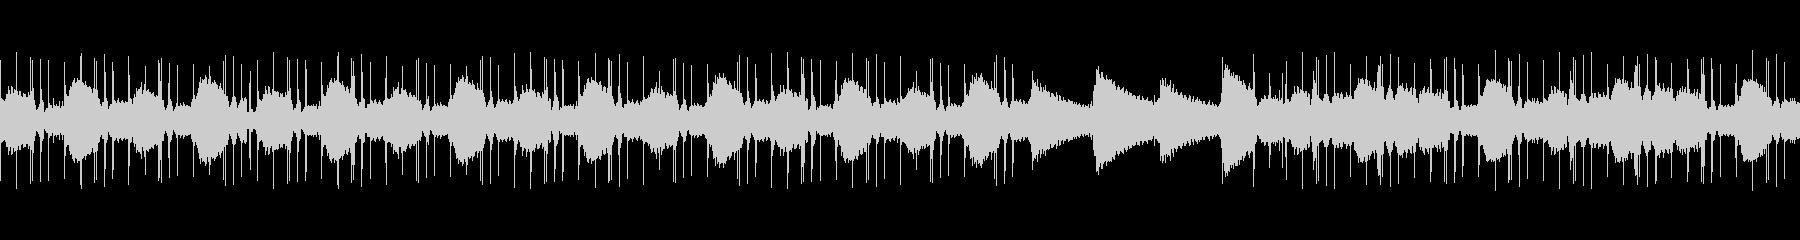 LoFiHipHopのChillっぽい曲の未再生の波形